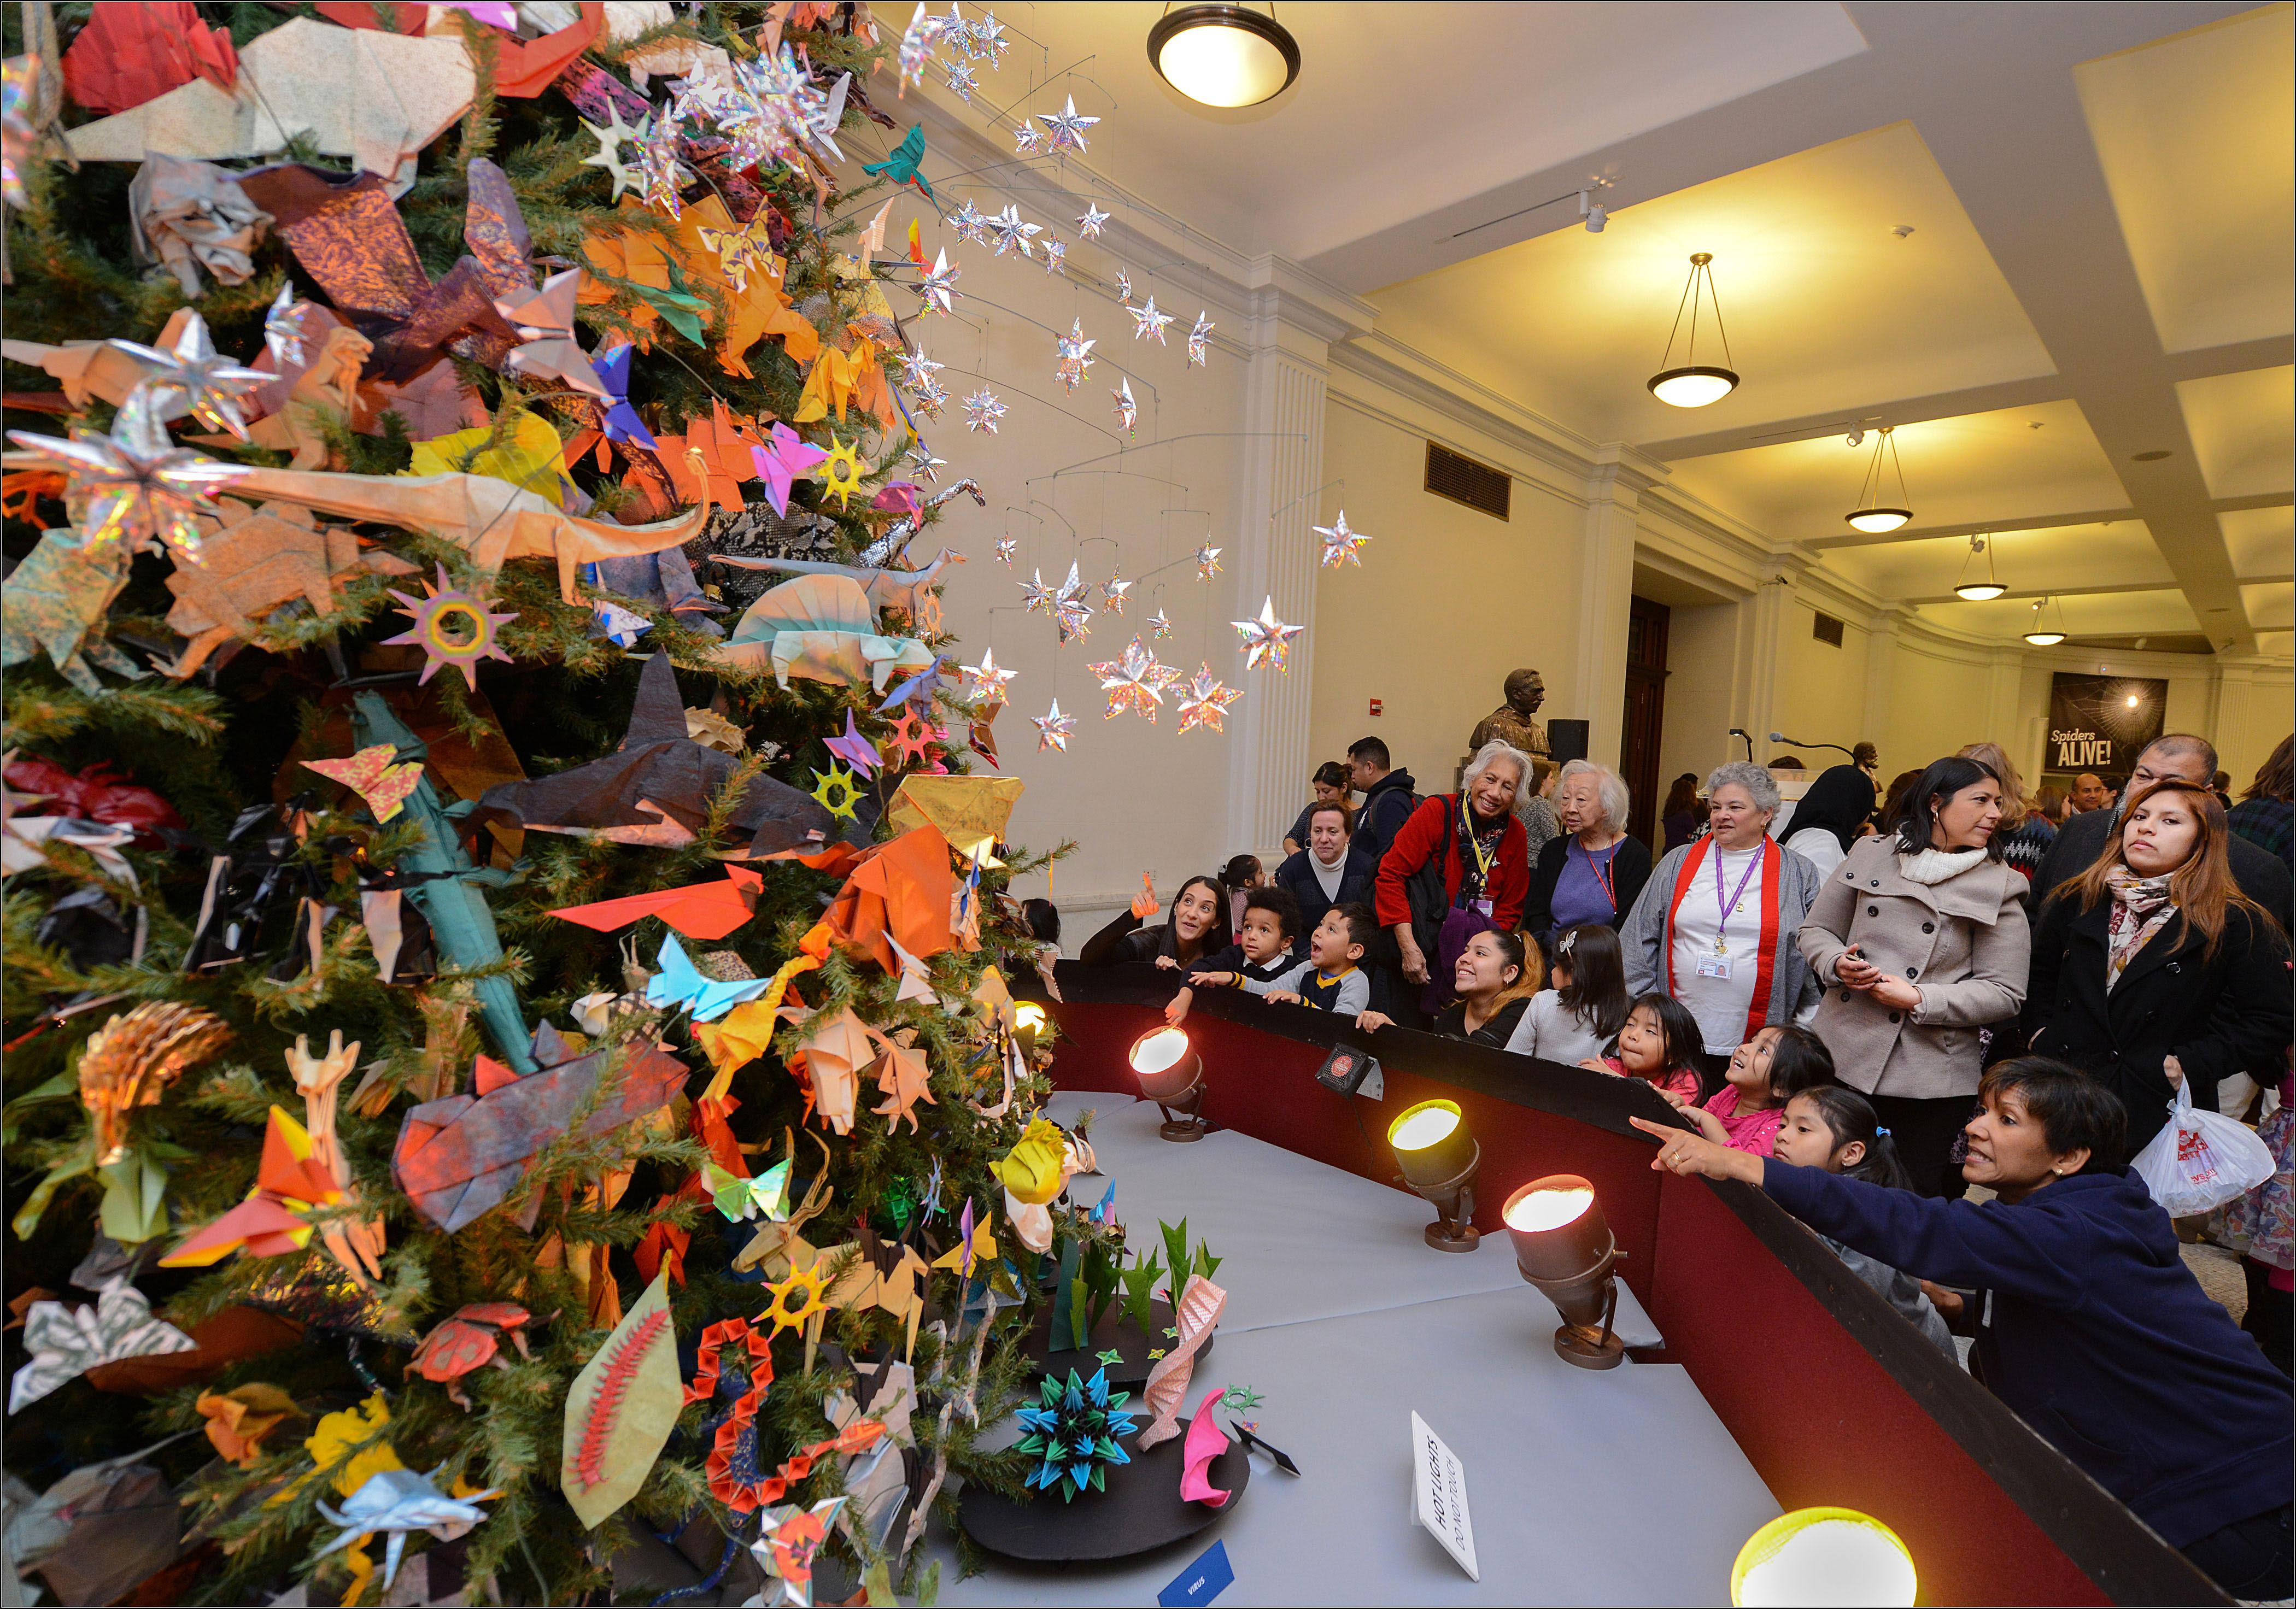 The Origami Holiday Tree at AMNH